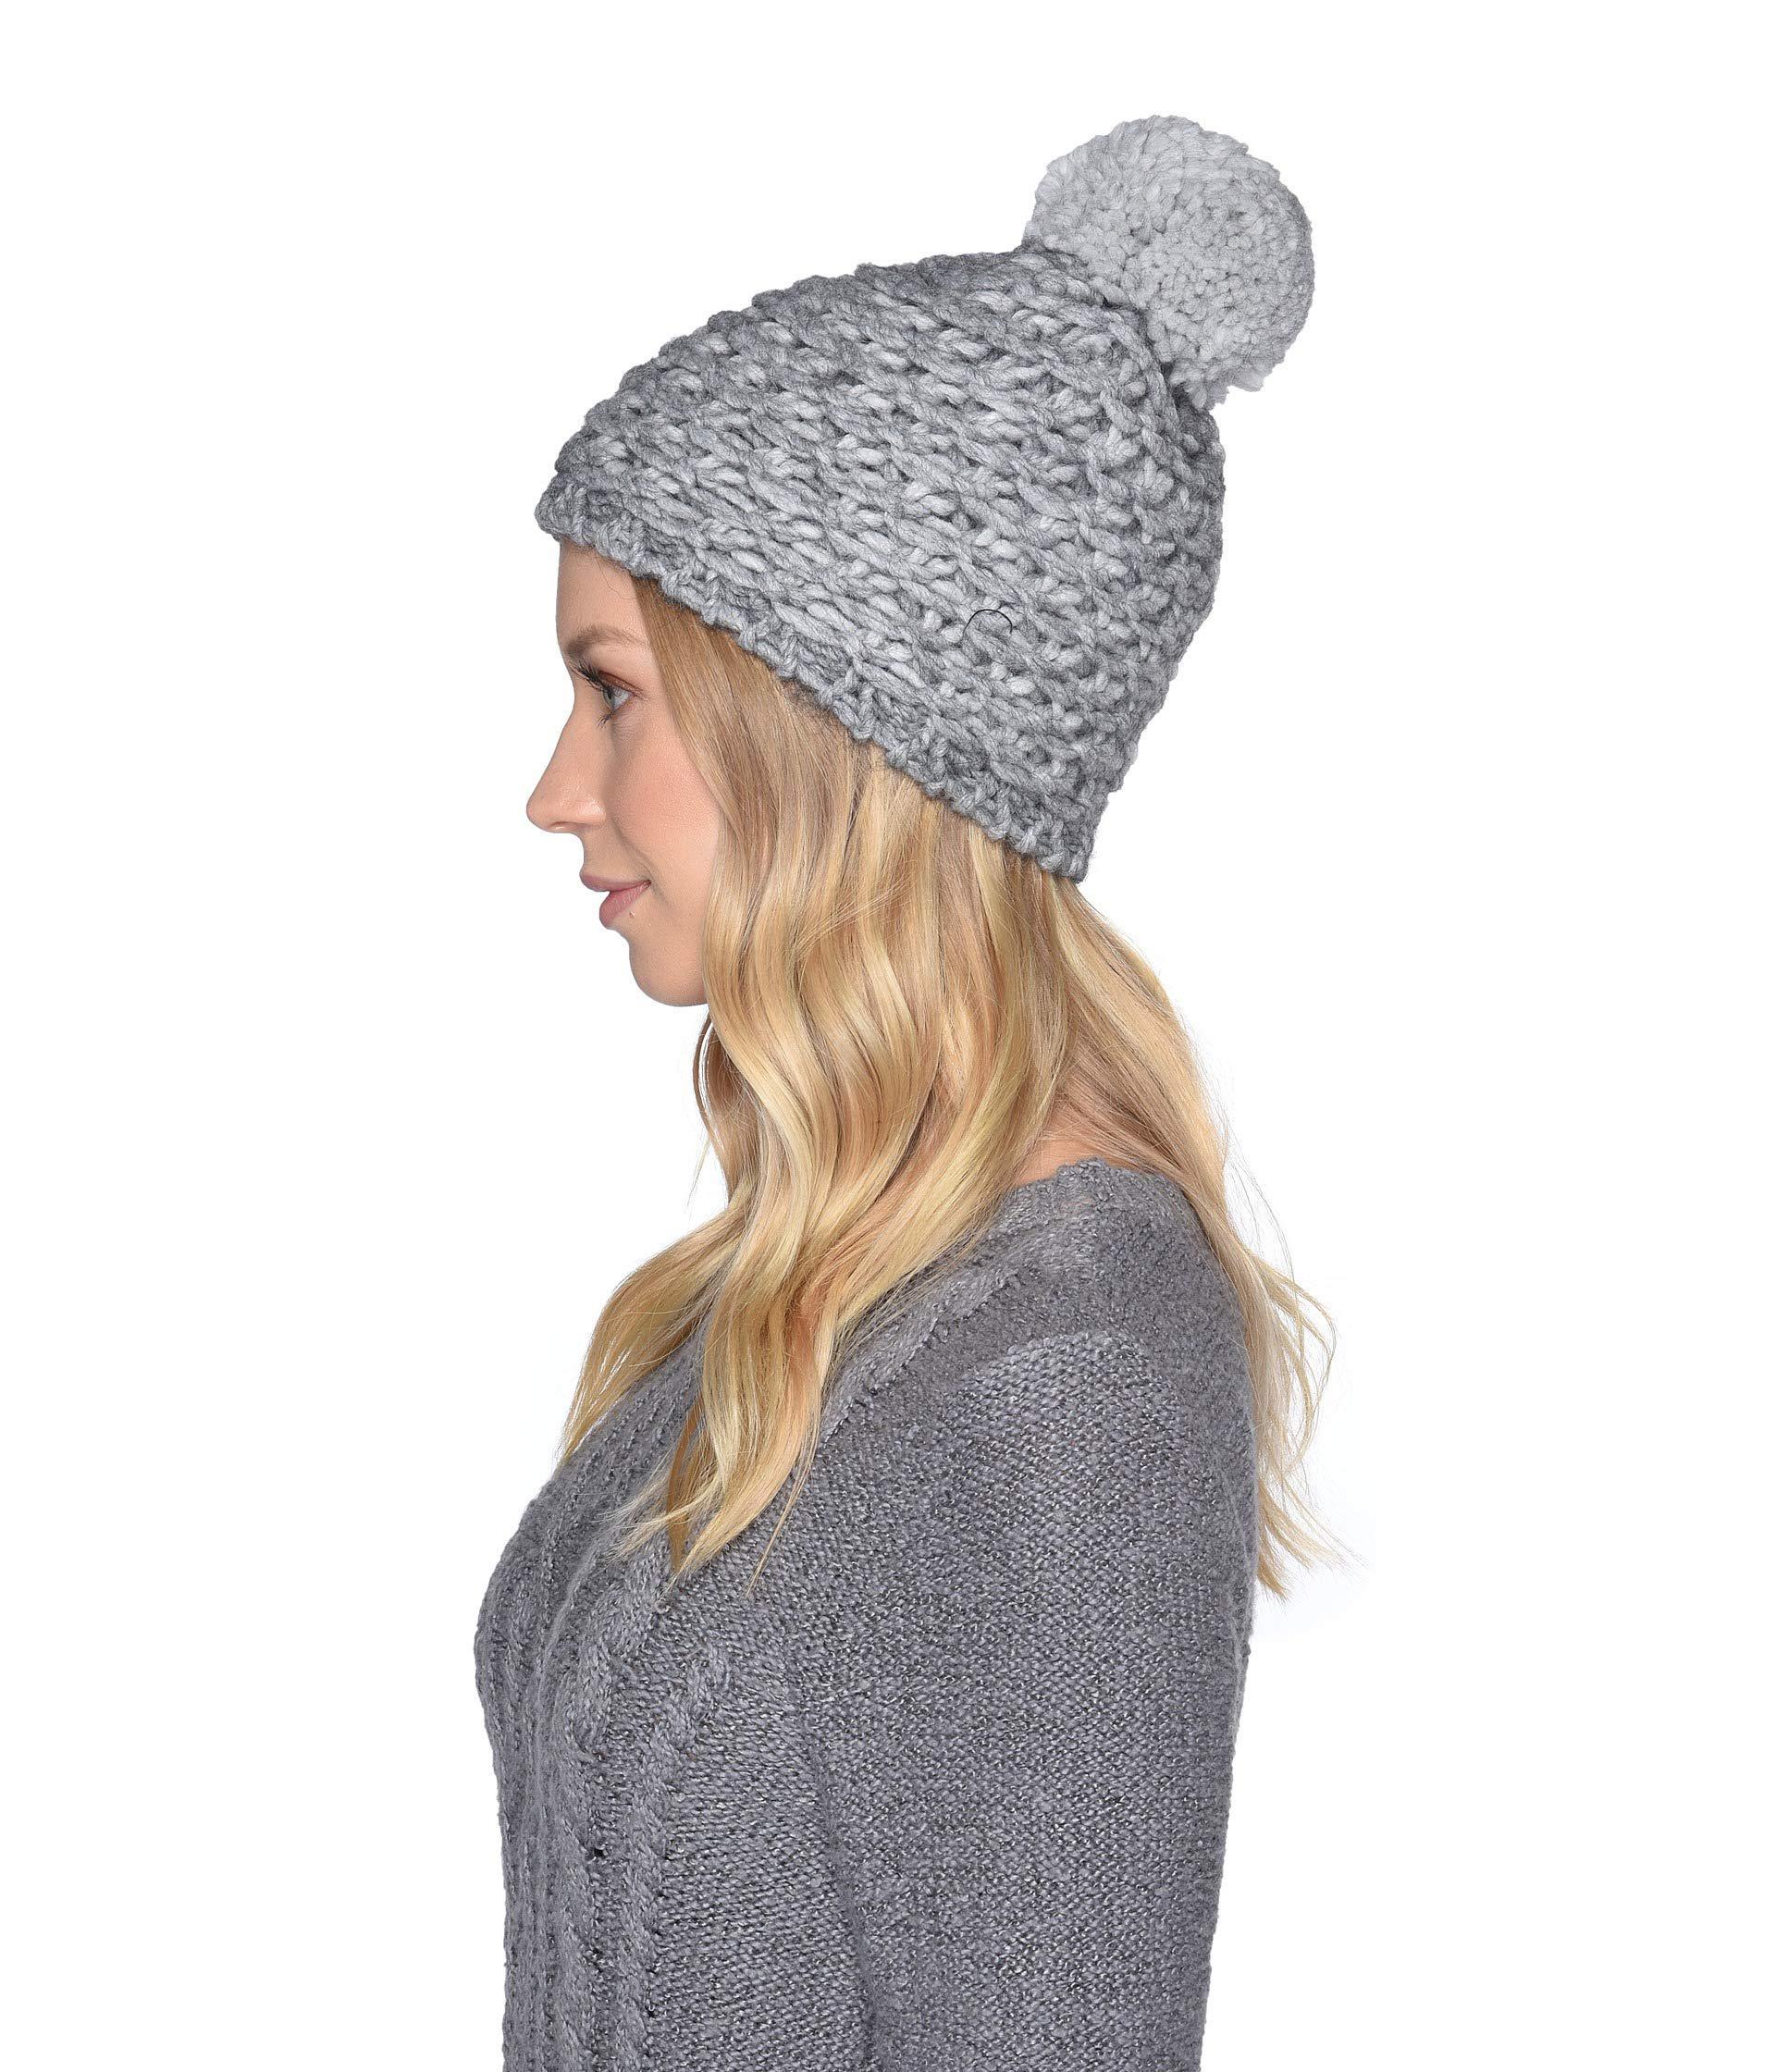 Lyst - UGG Yarn Pom Knit Hat (beige Multi) Caps in Gray 084721aadb03